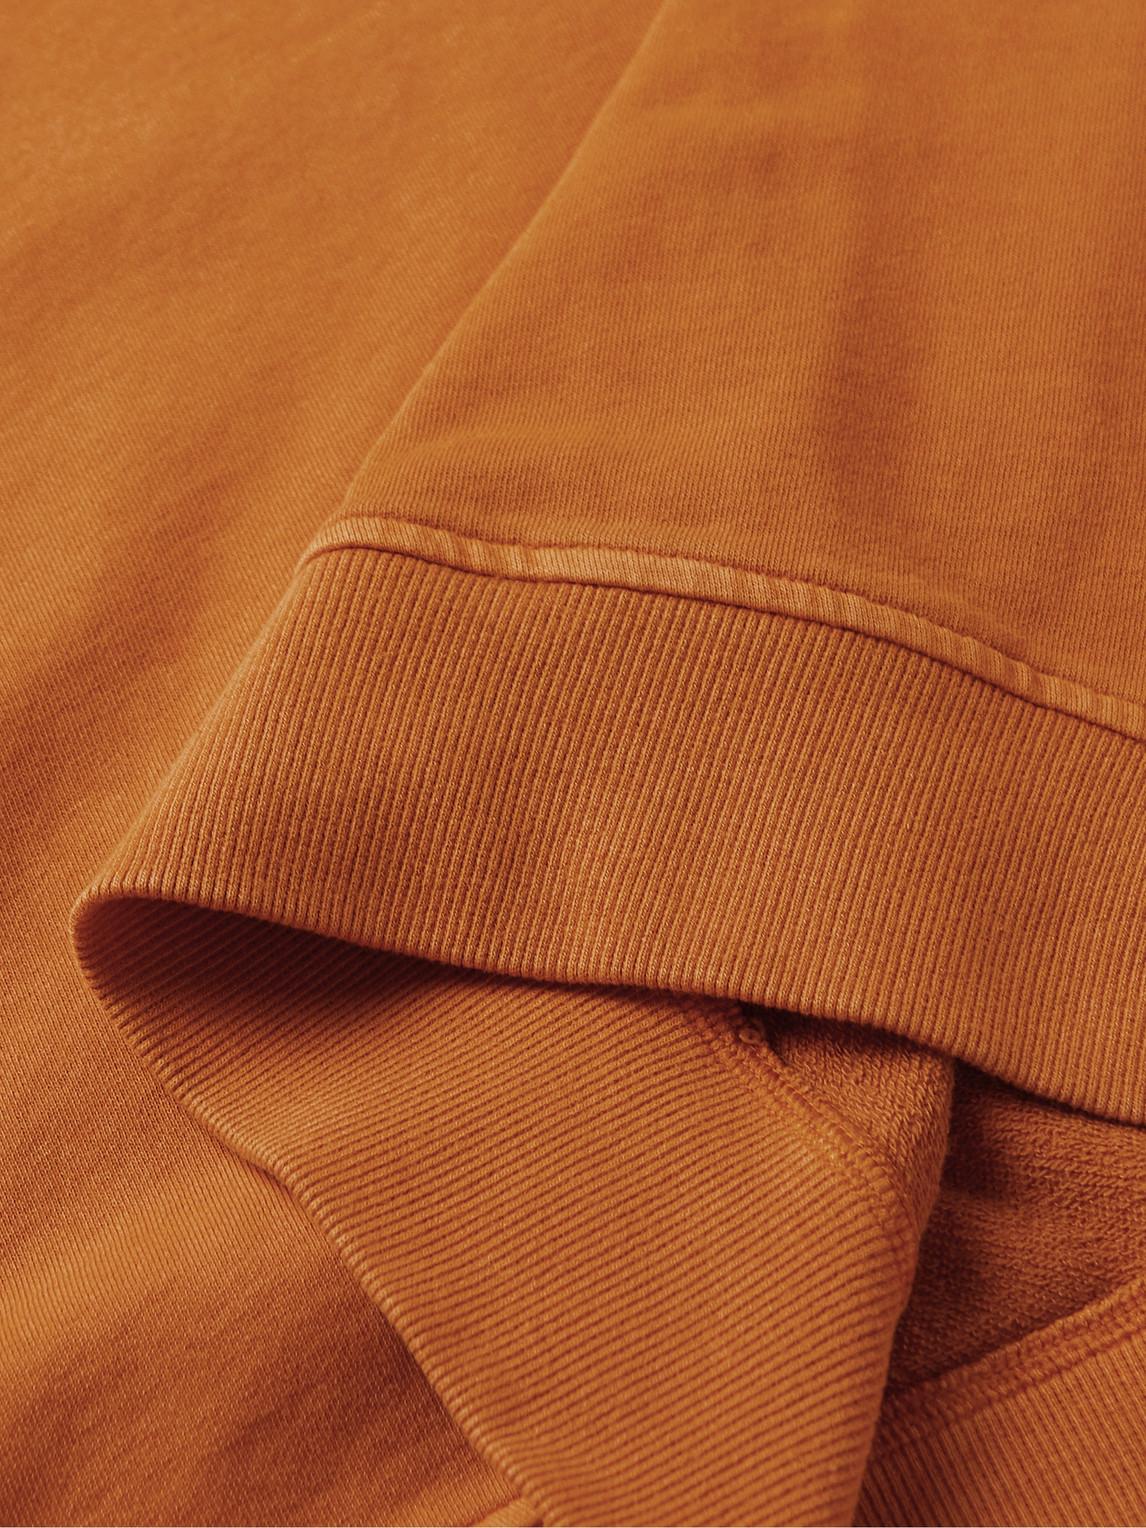 YMC YOU MUST CREATE Cottons SUGDEN LOOPBACK COTTON-JERSEY HALF-ZIP SWEATSHIRT